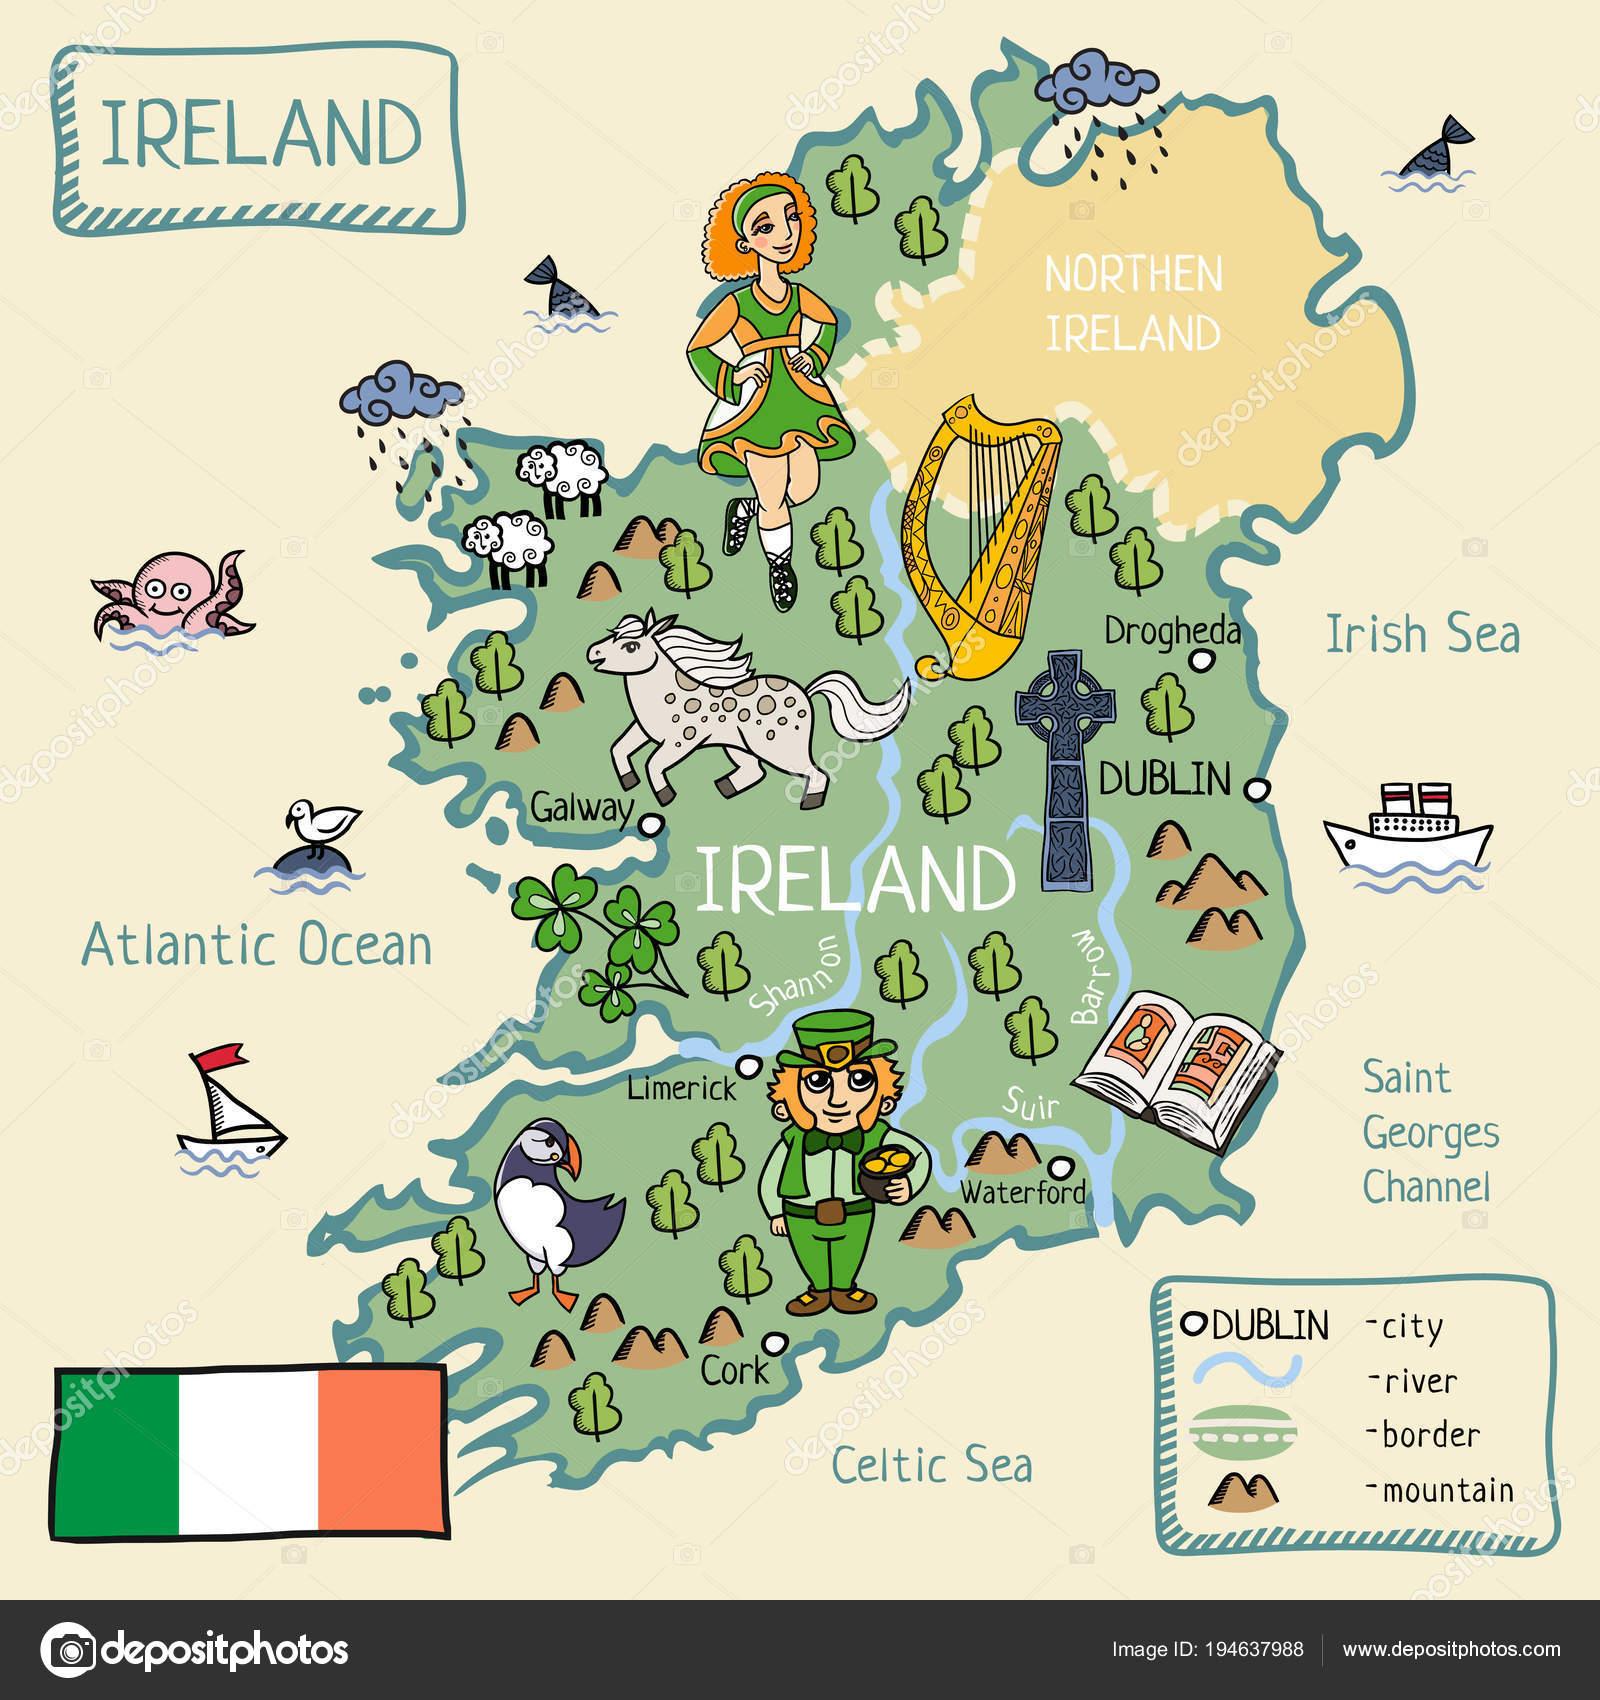 Irland Karte.Cartoon Karte Von Irland Stockvektor C Lashmipics 194637988